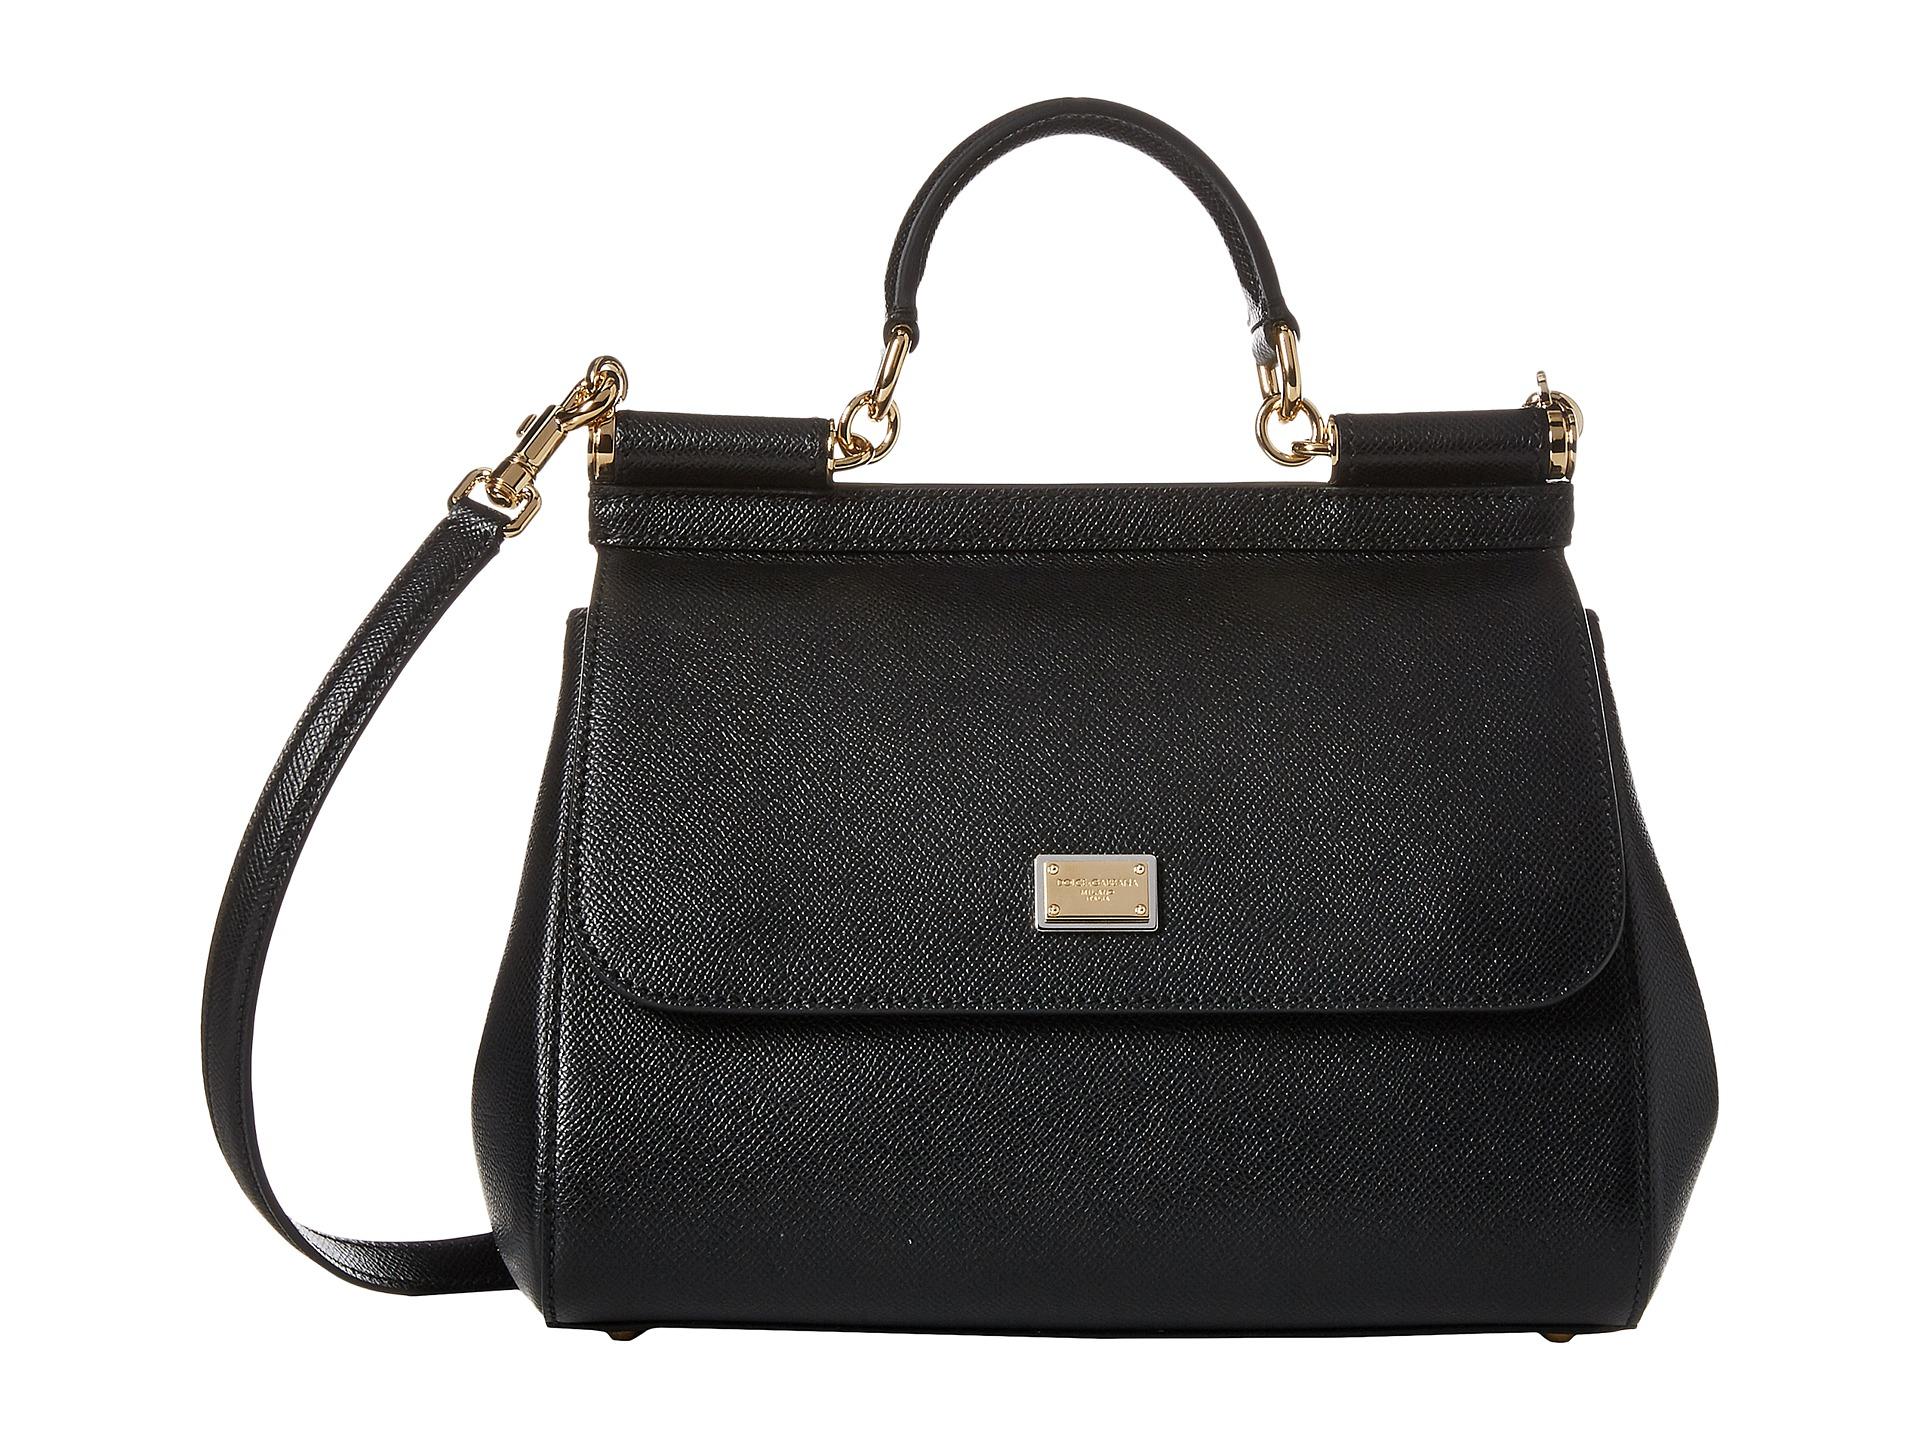 Lyst - Dolce   Gabbana Borsa A Mano Vitello Stampa Dauphine in Black e98c37aa54d36